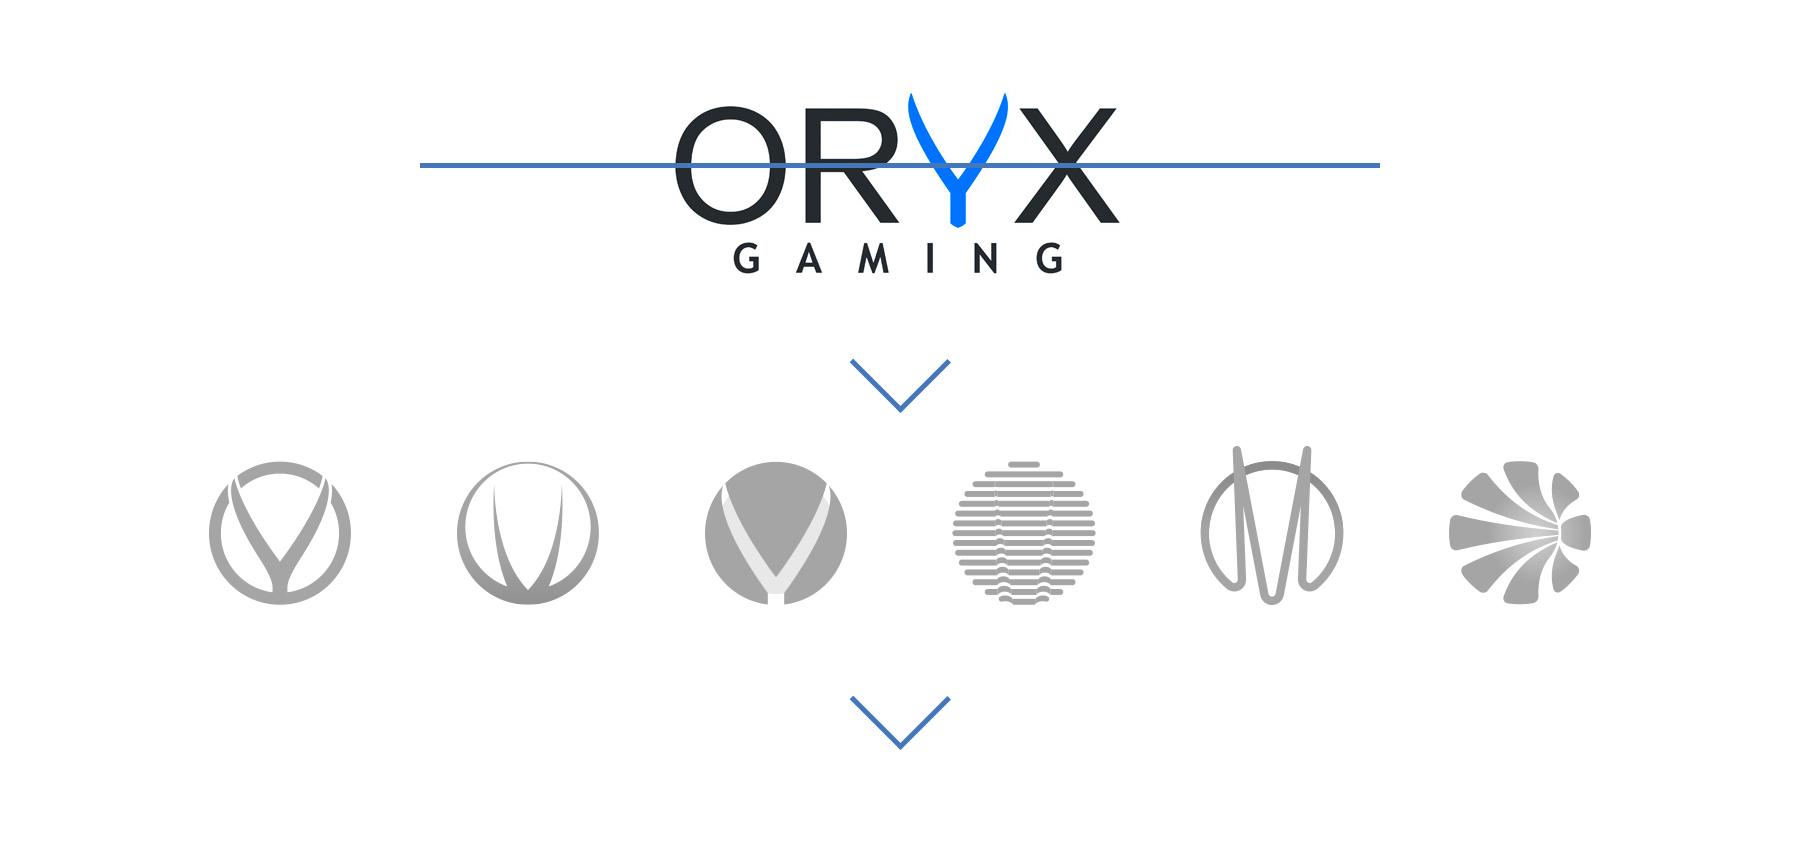 oryx_gaming_00.jpg